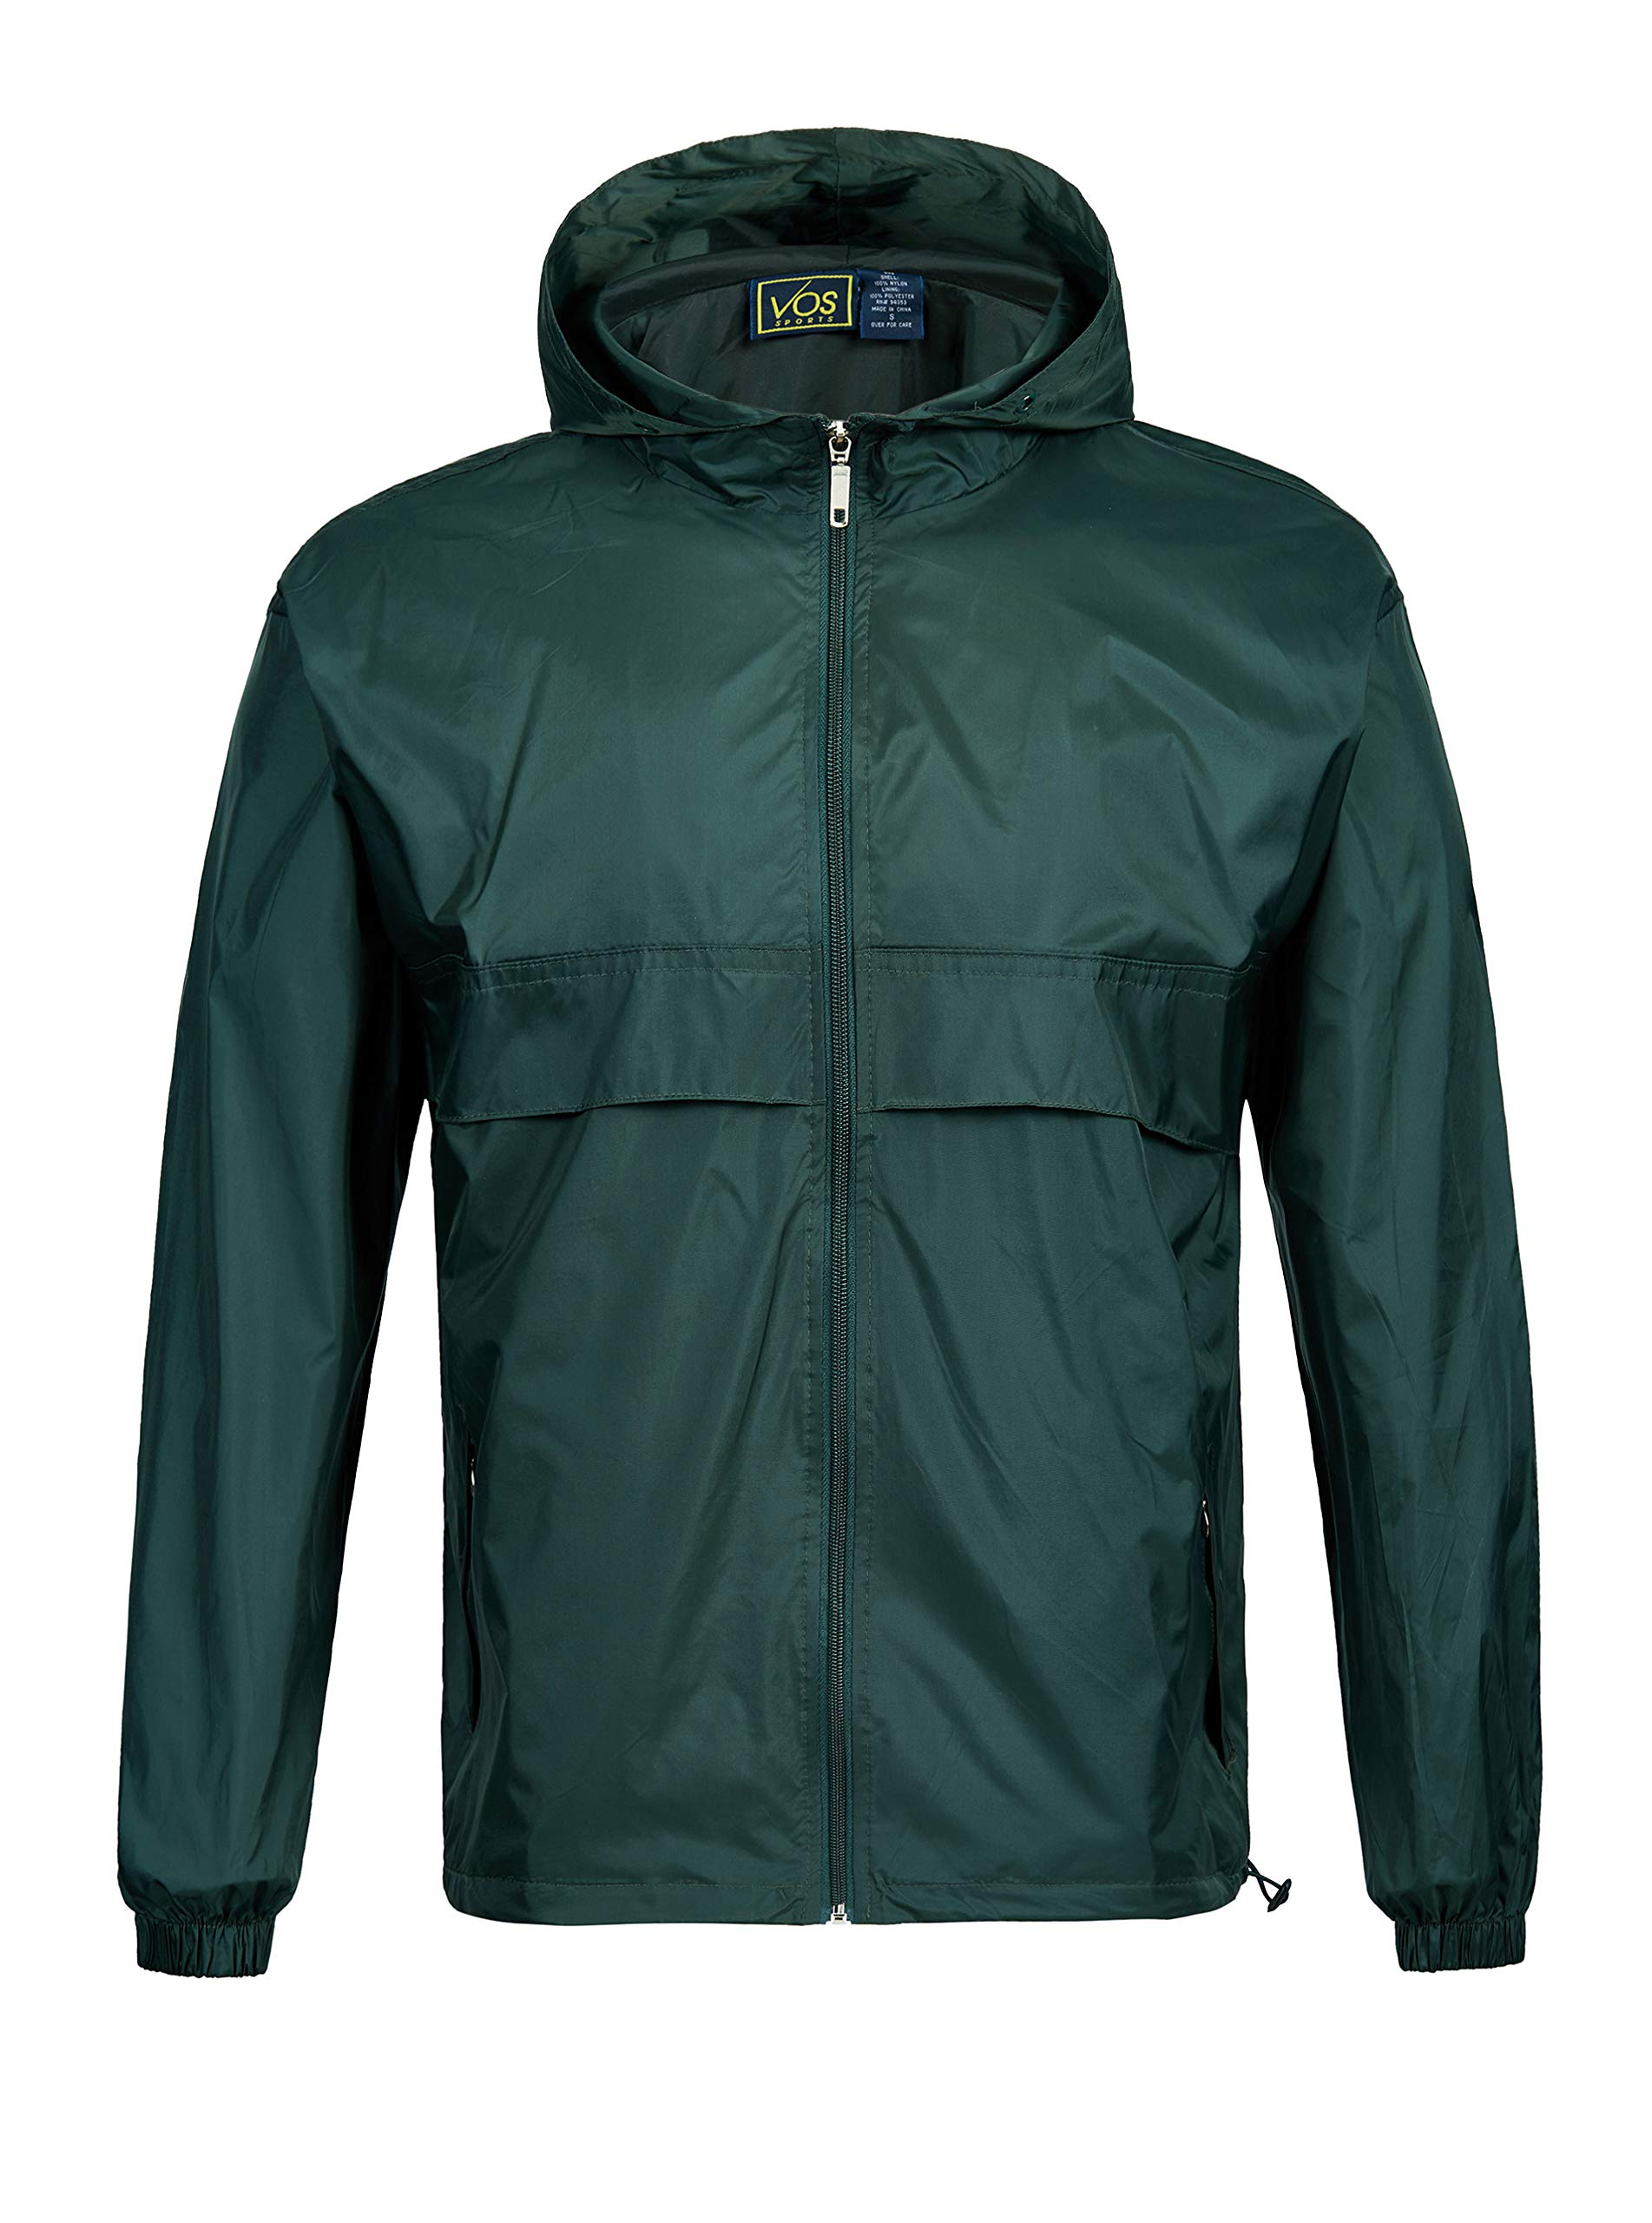 GEEK LIGHTING Rain Jacket for Men, Outdoor Zipper Waterproof Lightweight Raincoat Windbreaker with Hooded (Dark Green, Large) by GEEK LIGHTING